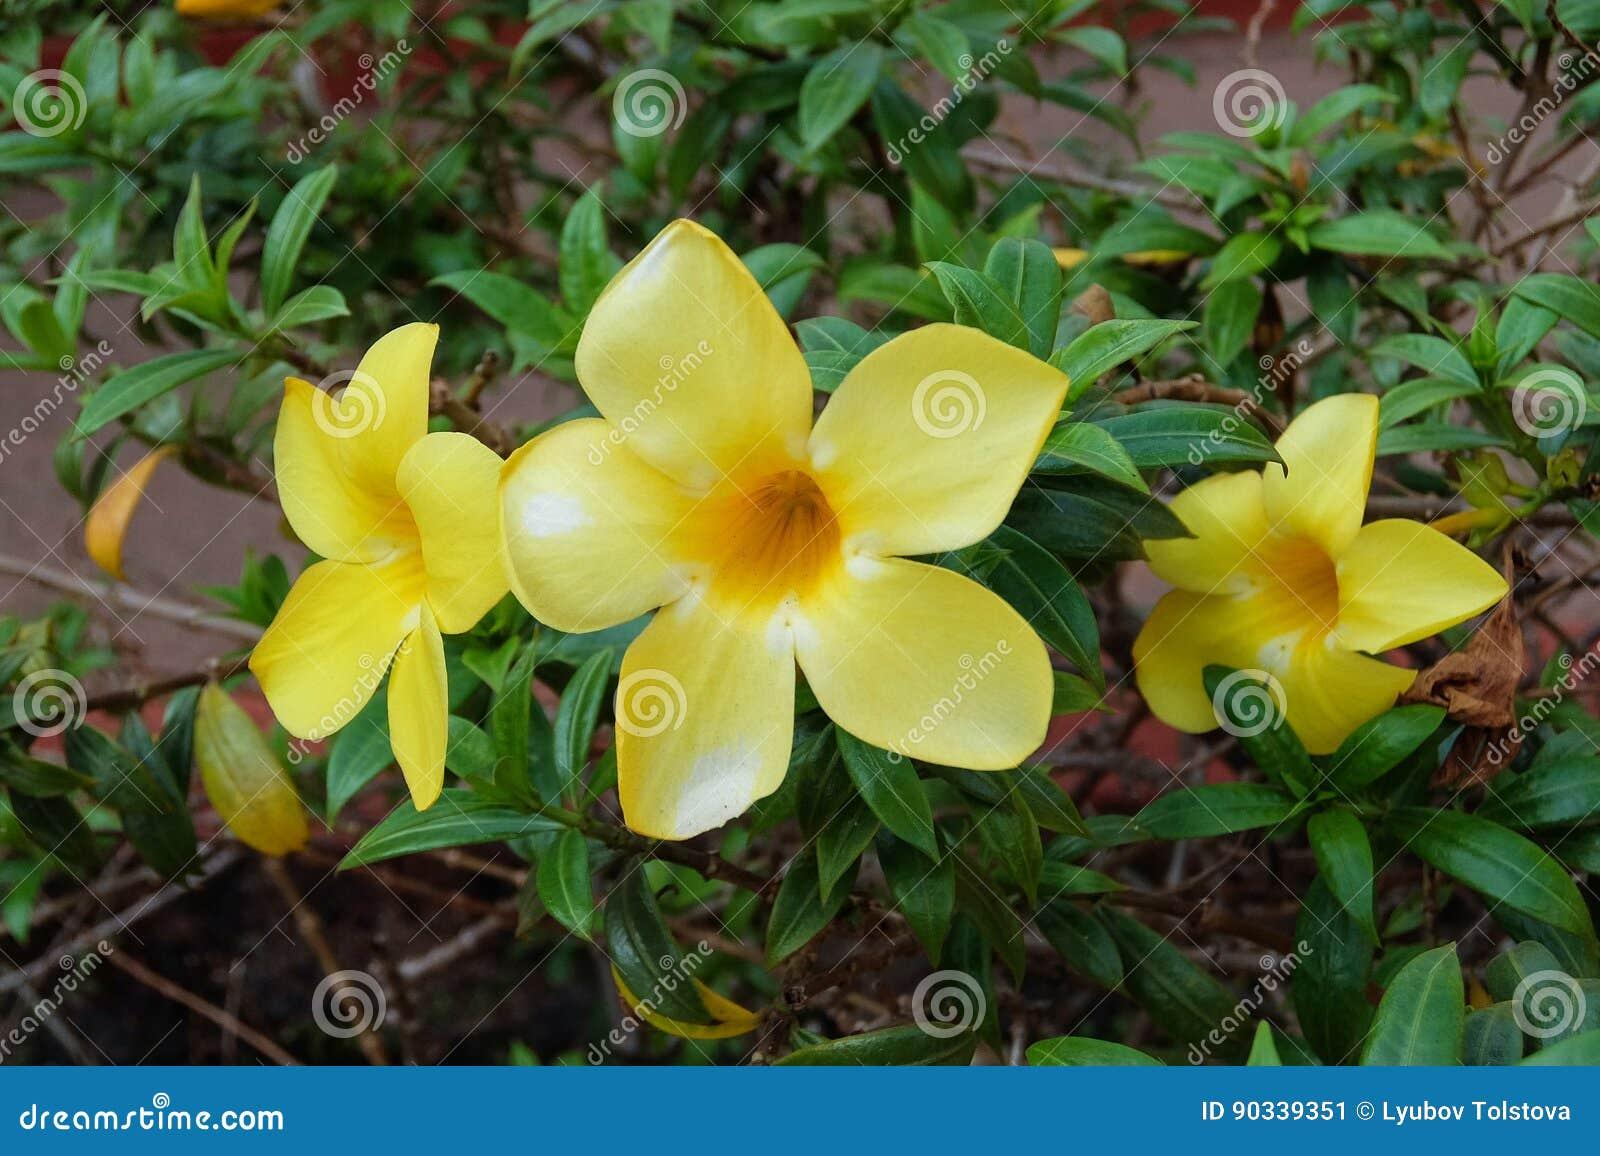 Allamanda Cathartica Yellow Bell Golden Trumpet Vine Stock Image